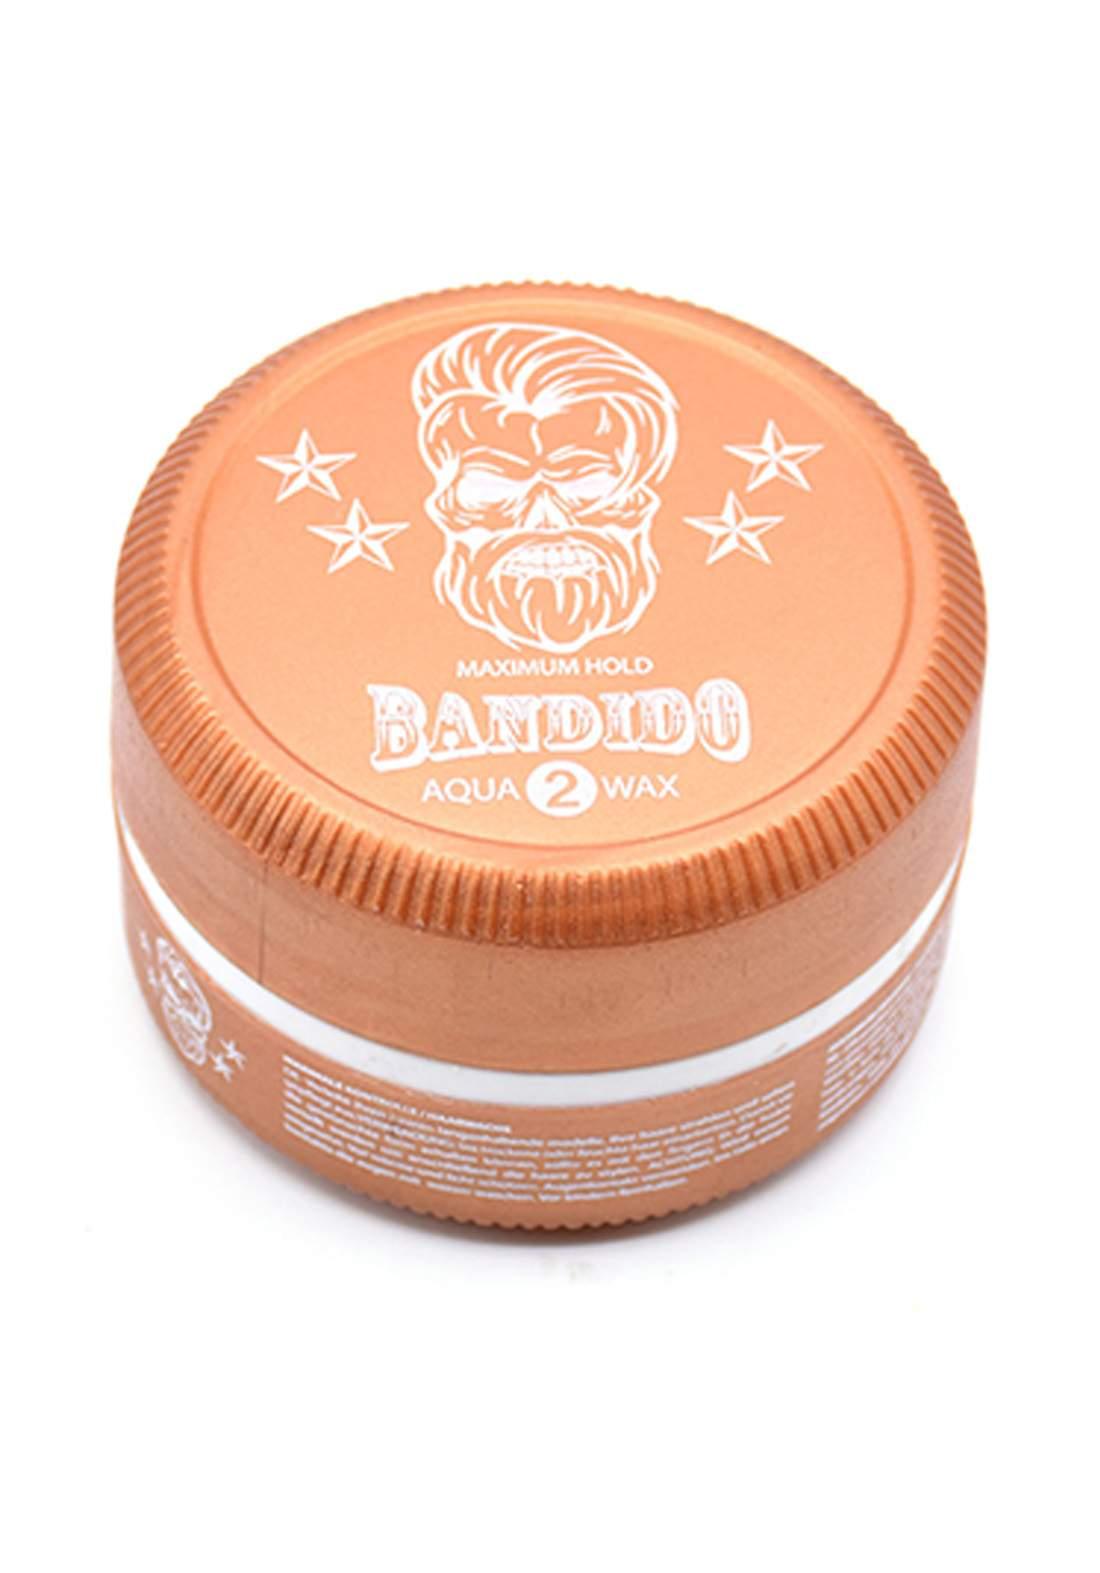 Bandido Aqua 2 Wax  Maximum Hold-150ml جل تصفيف الشعر